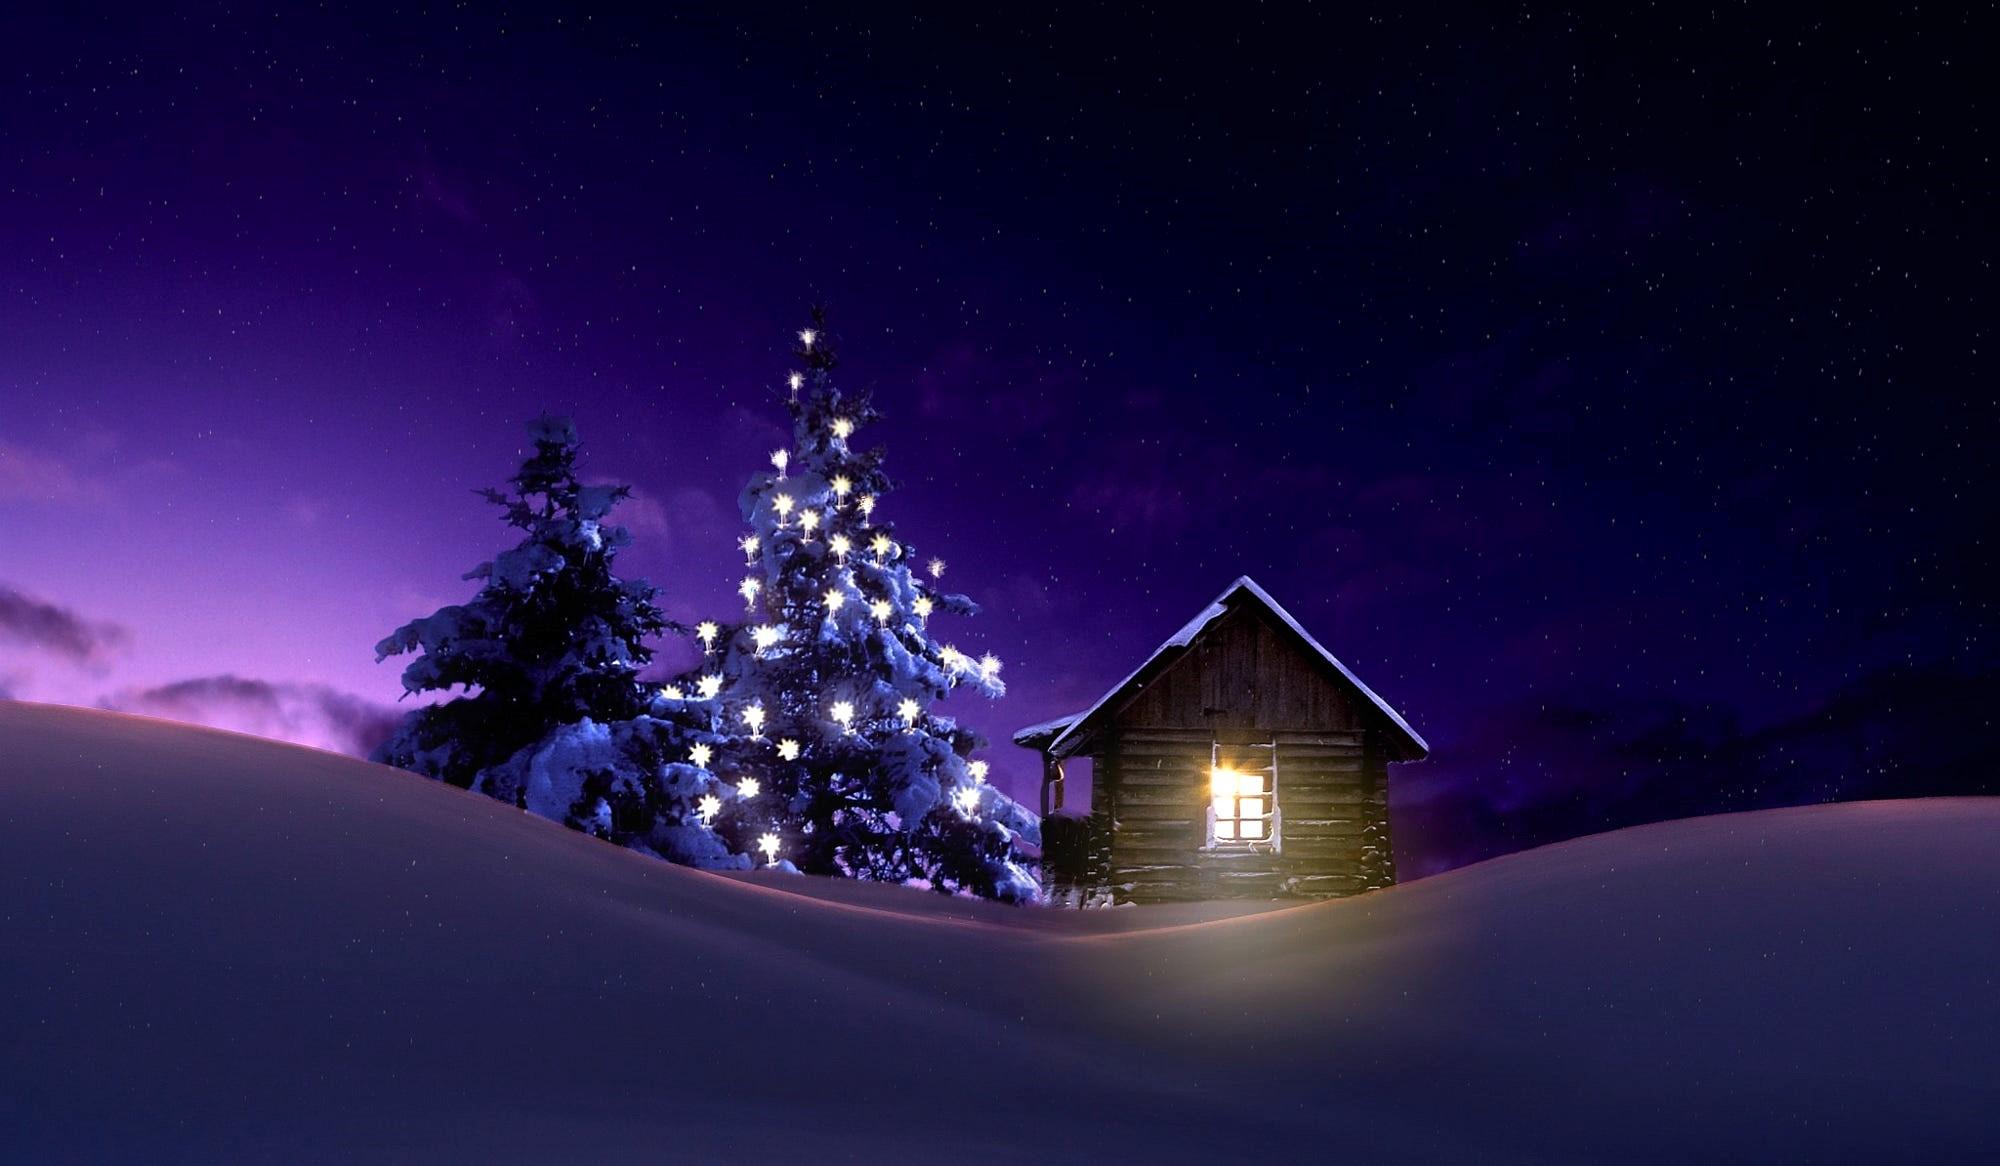 Lighted Tree Outside Winter Cabin Hd